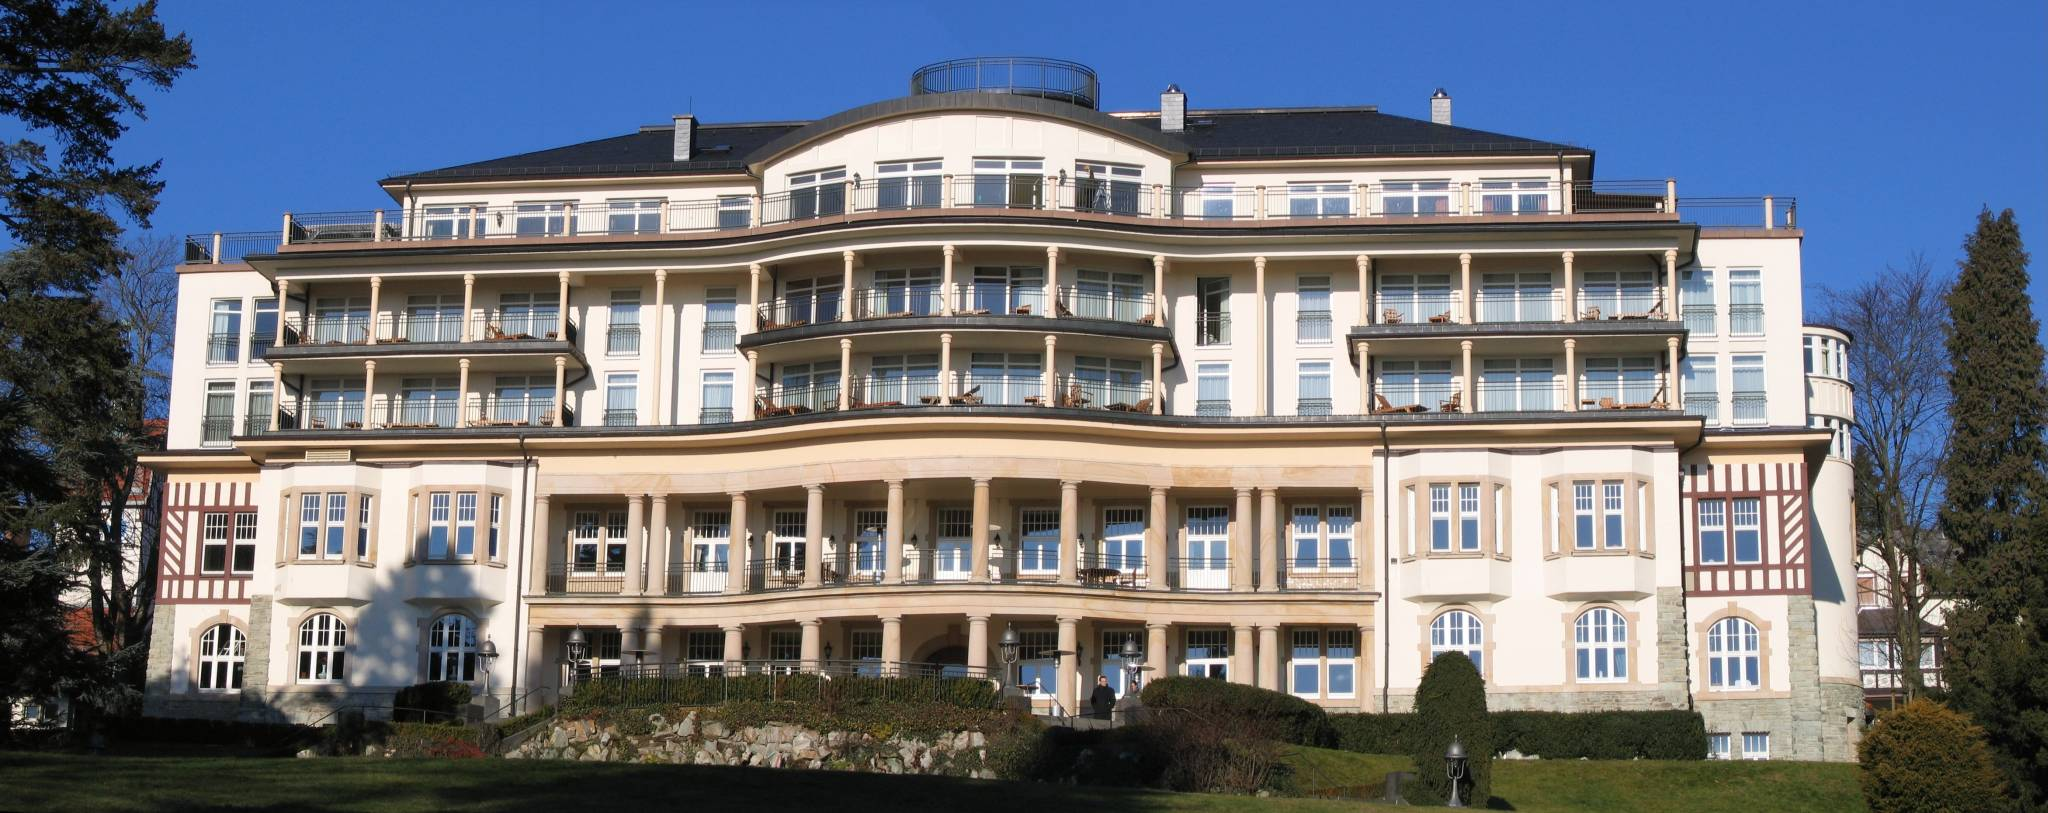 Hotel Falk Frankfurt Bewertung